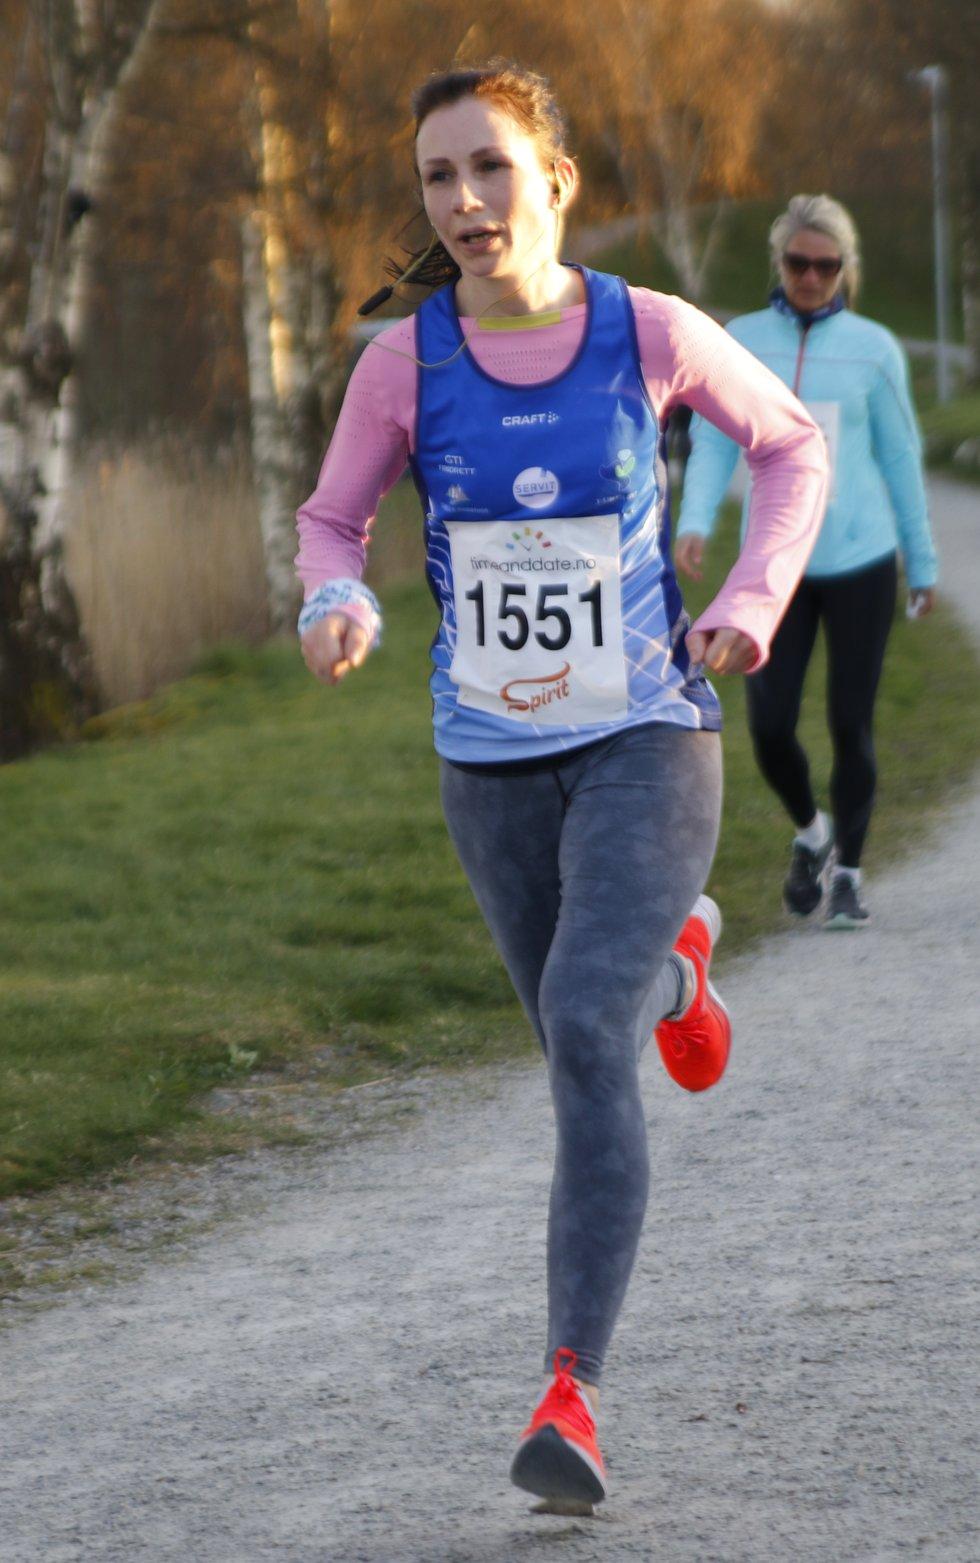 Hålandsvannet halvmaraton 2019